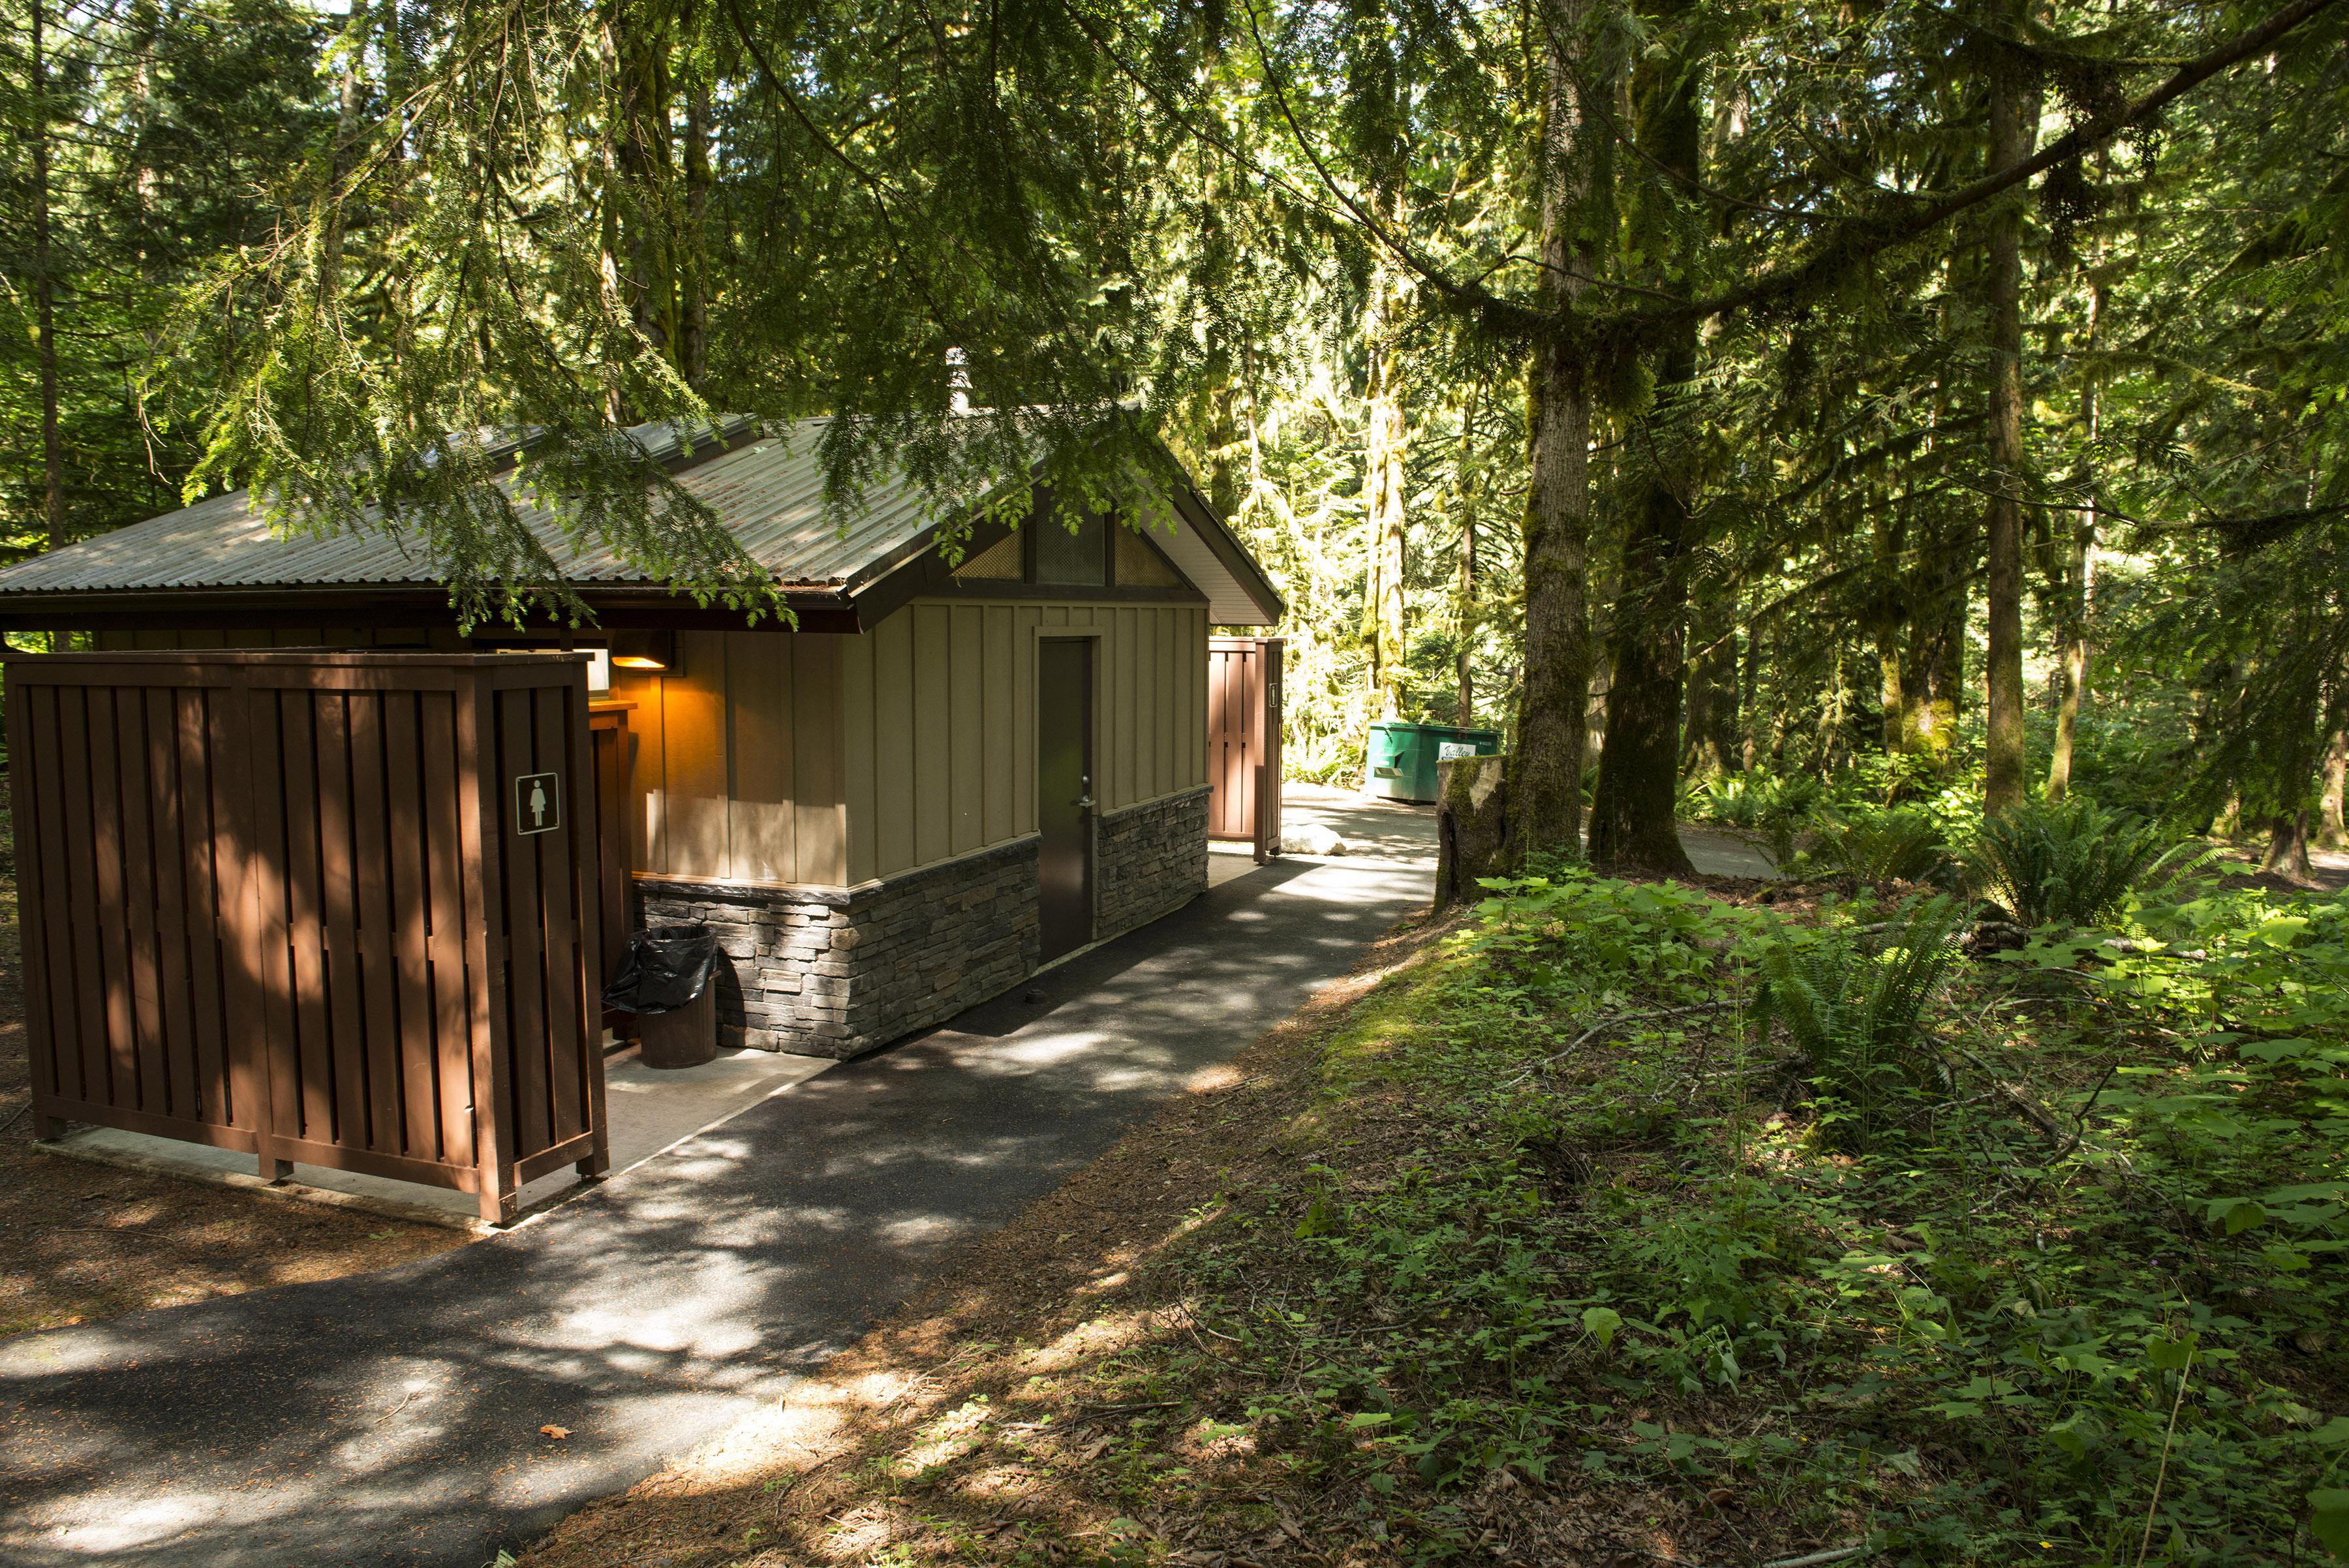 Entrance bay campground cultus lake provincial park for Cabins at cultus lake